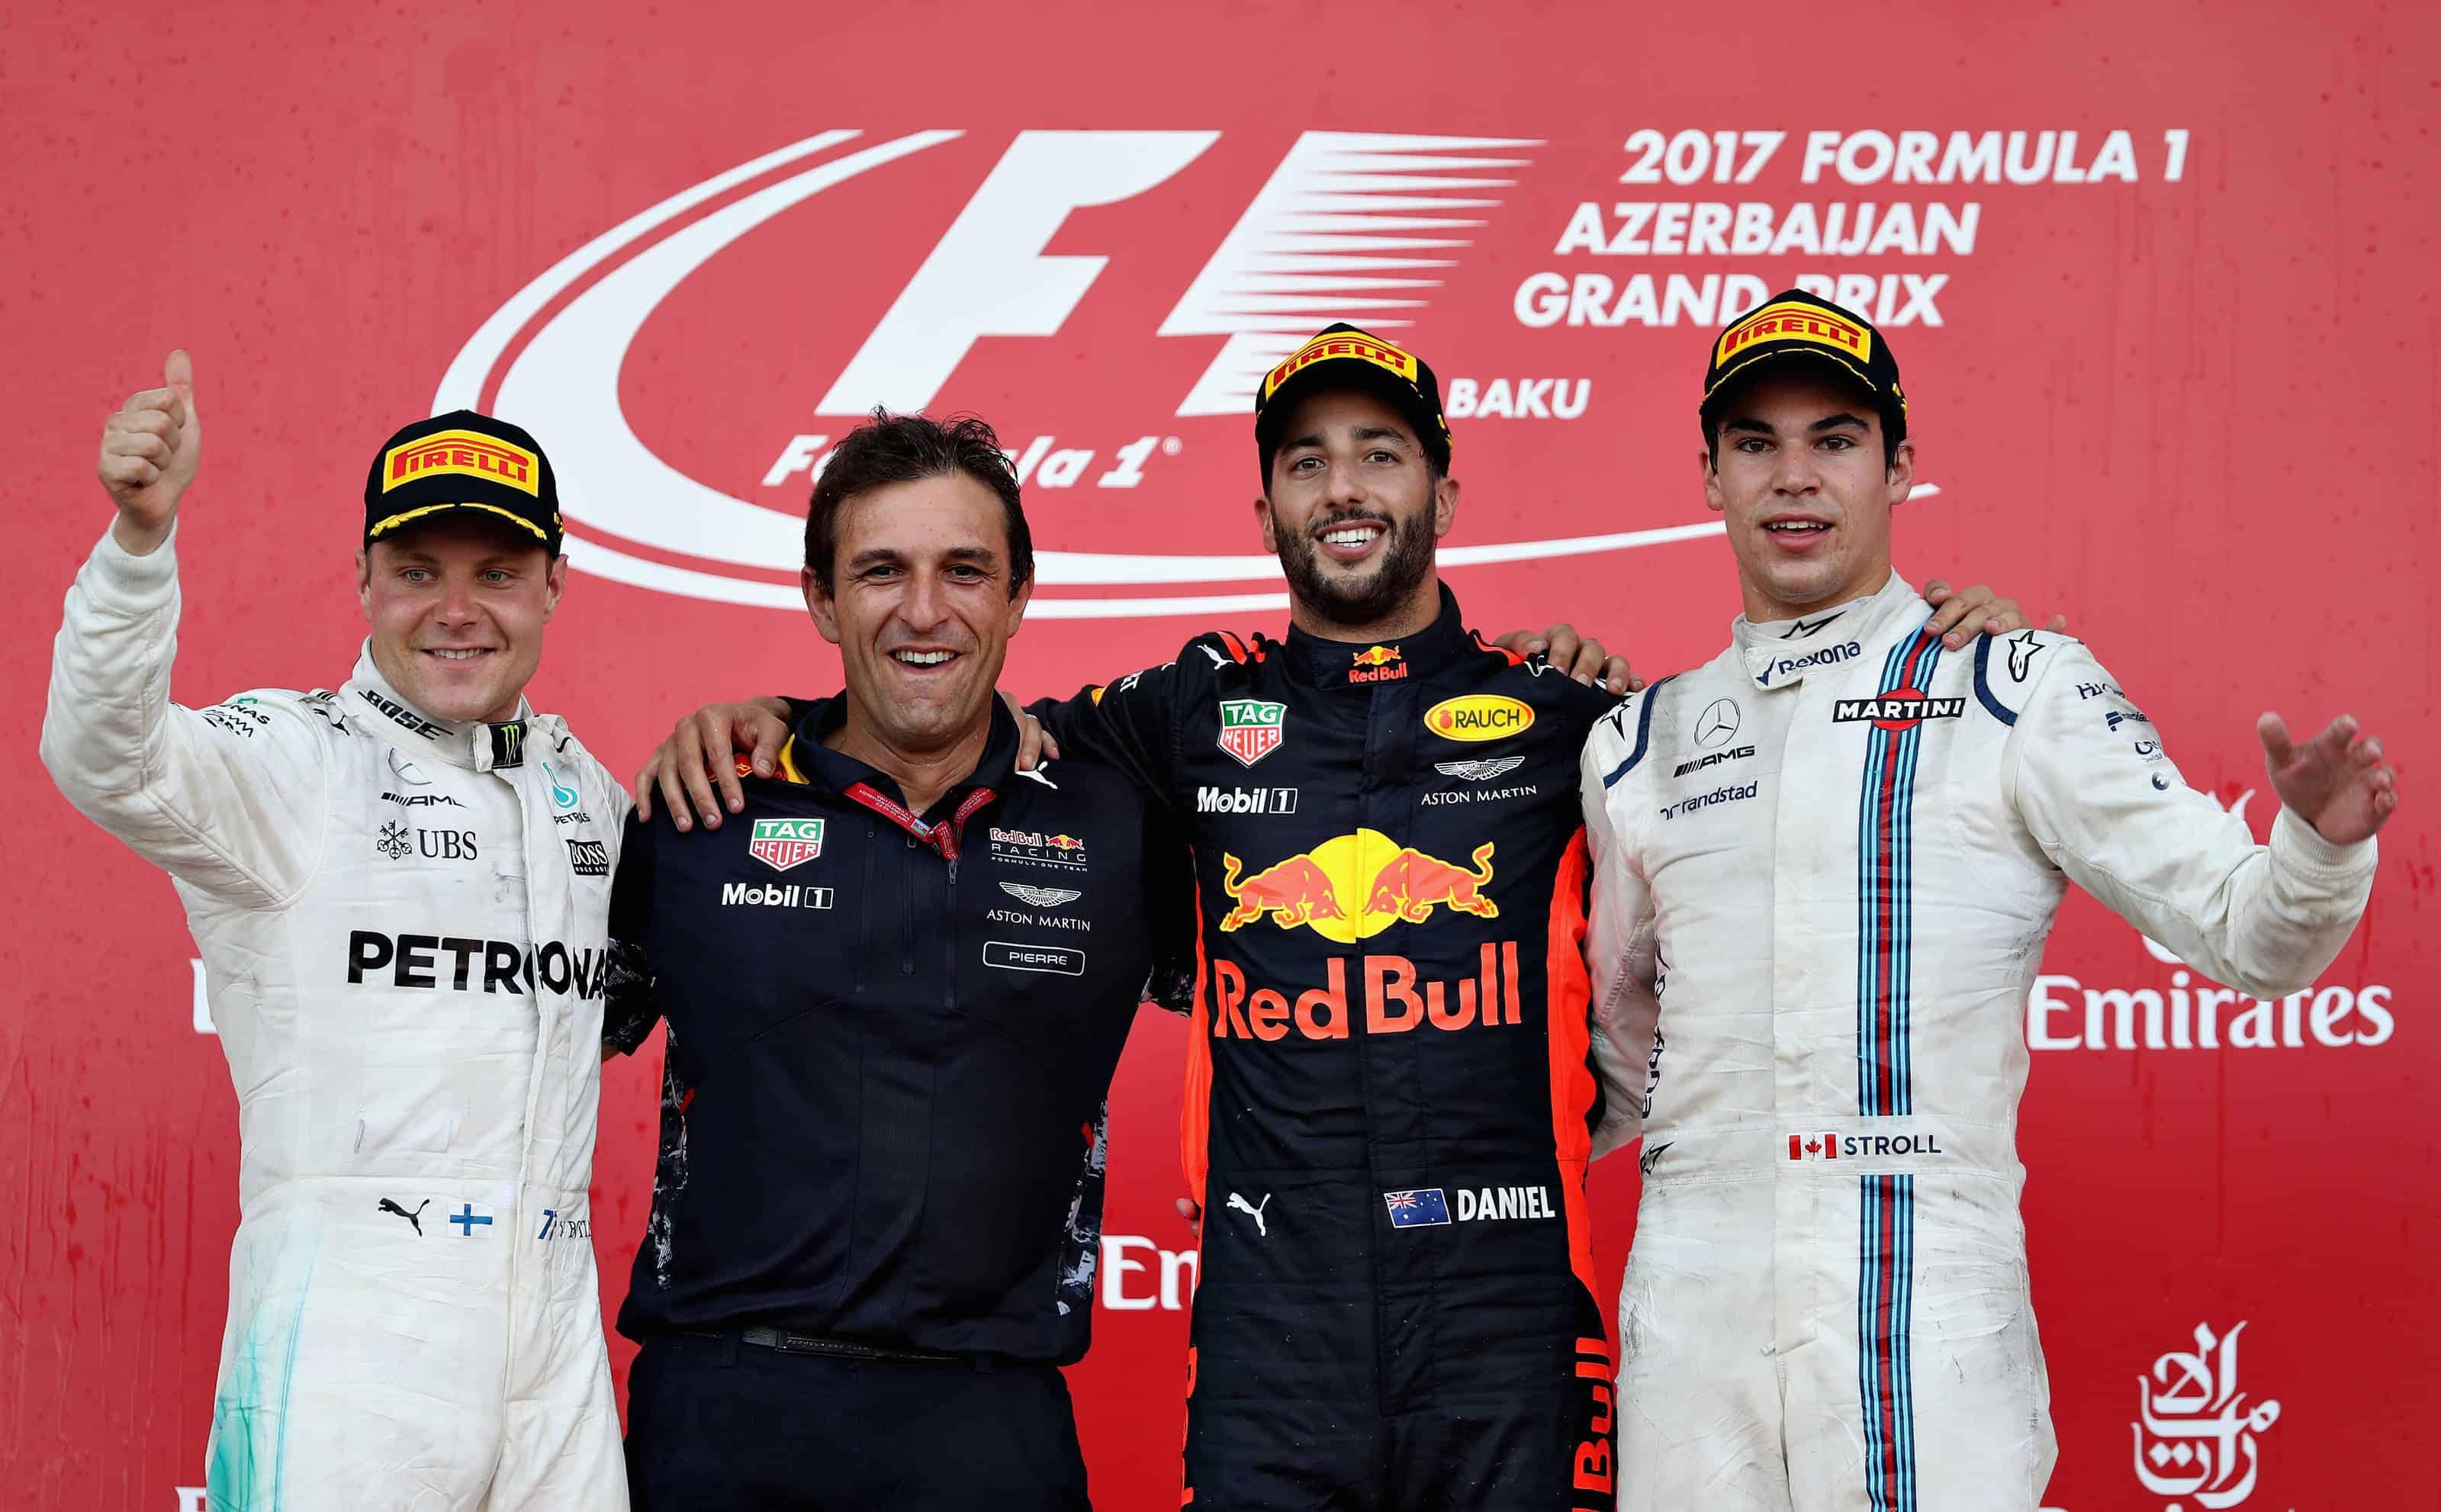 Pierre Wache Bottas Ricciardo Stroll Azerbaijan F1 2017 podium Photo Red Bull